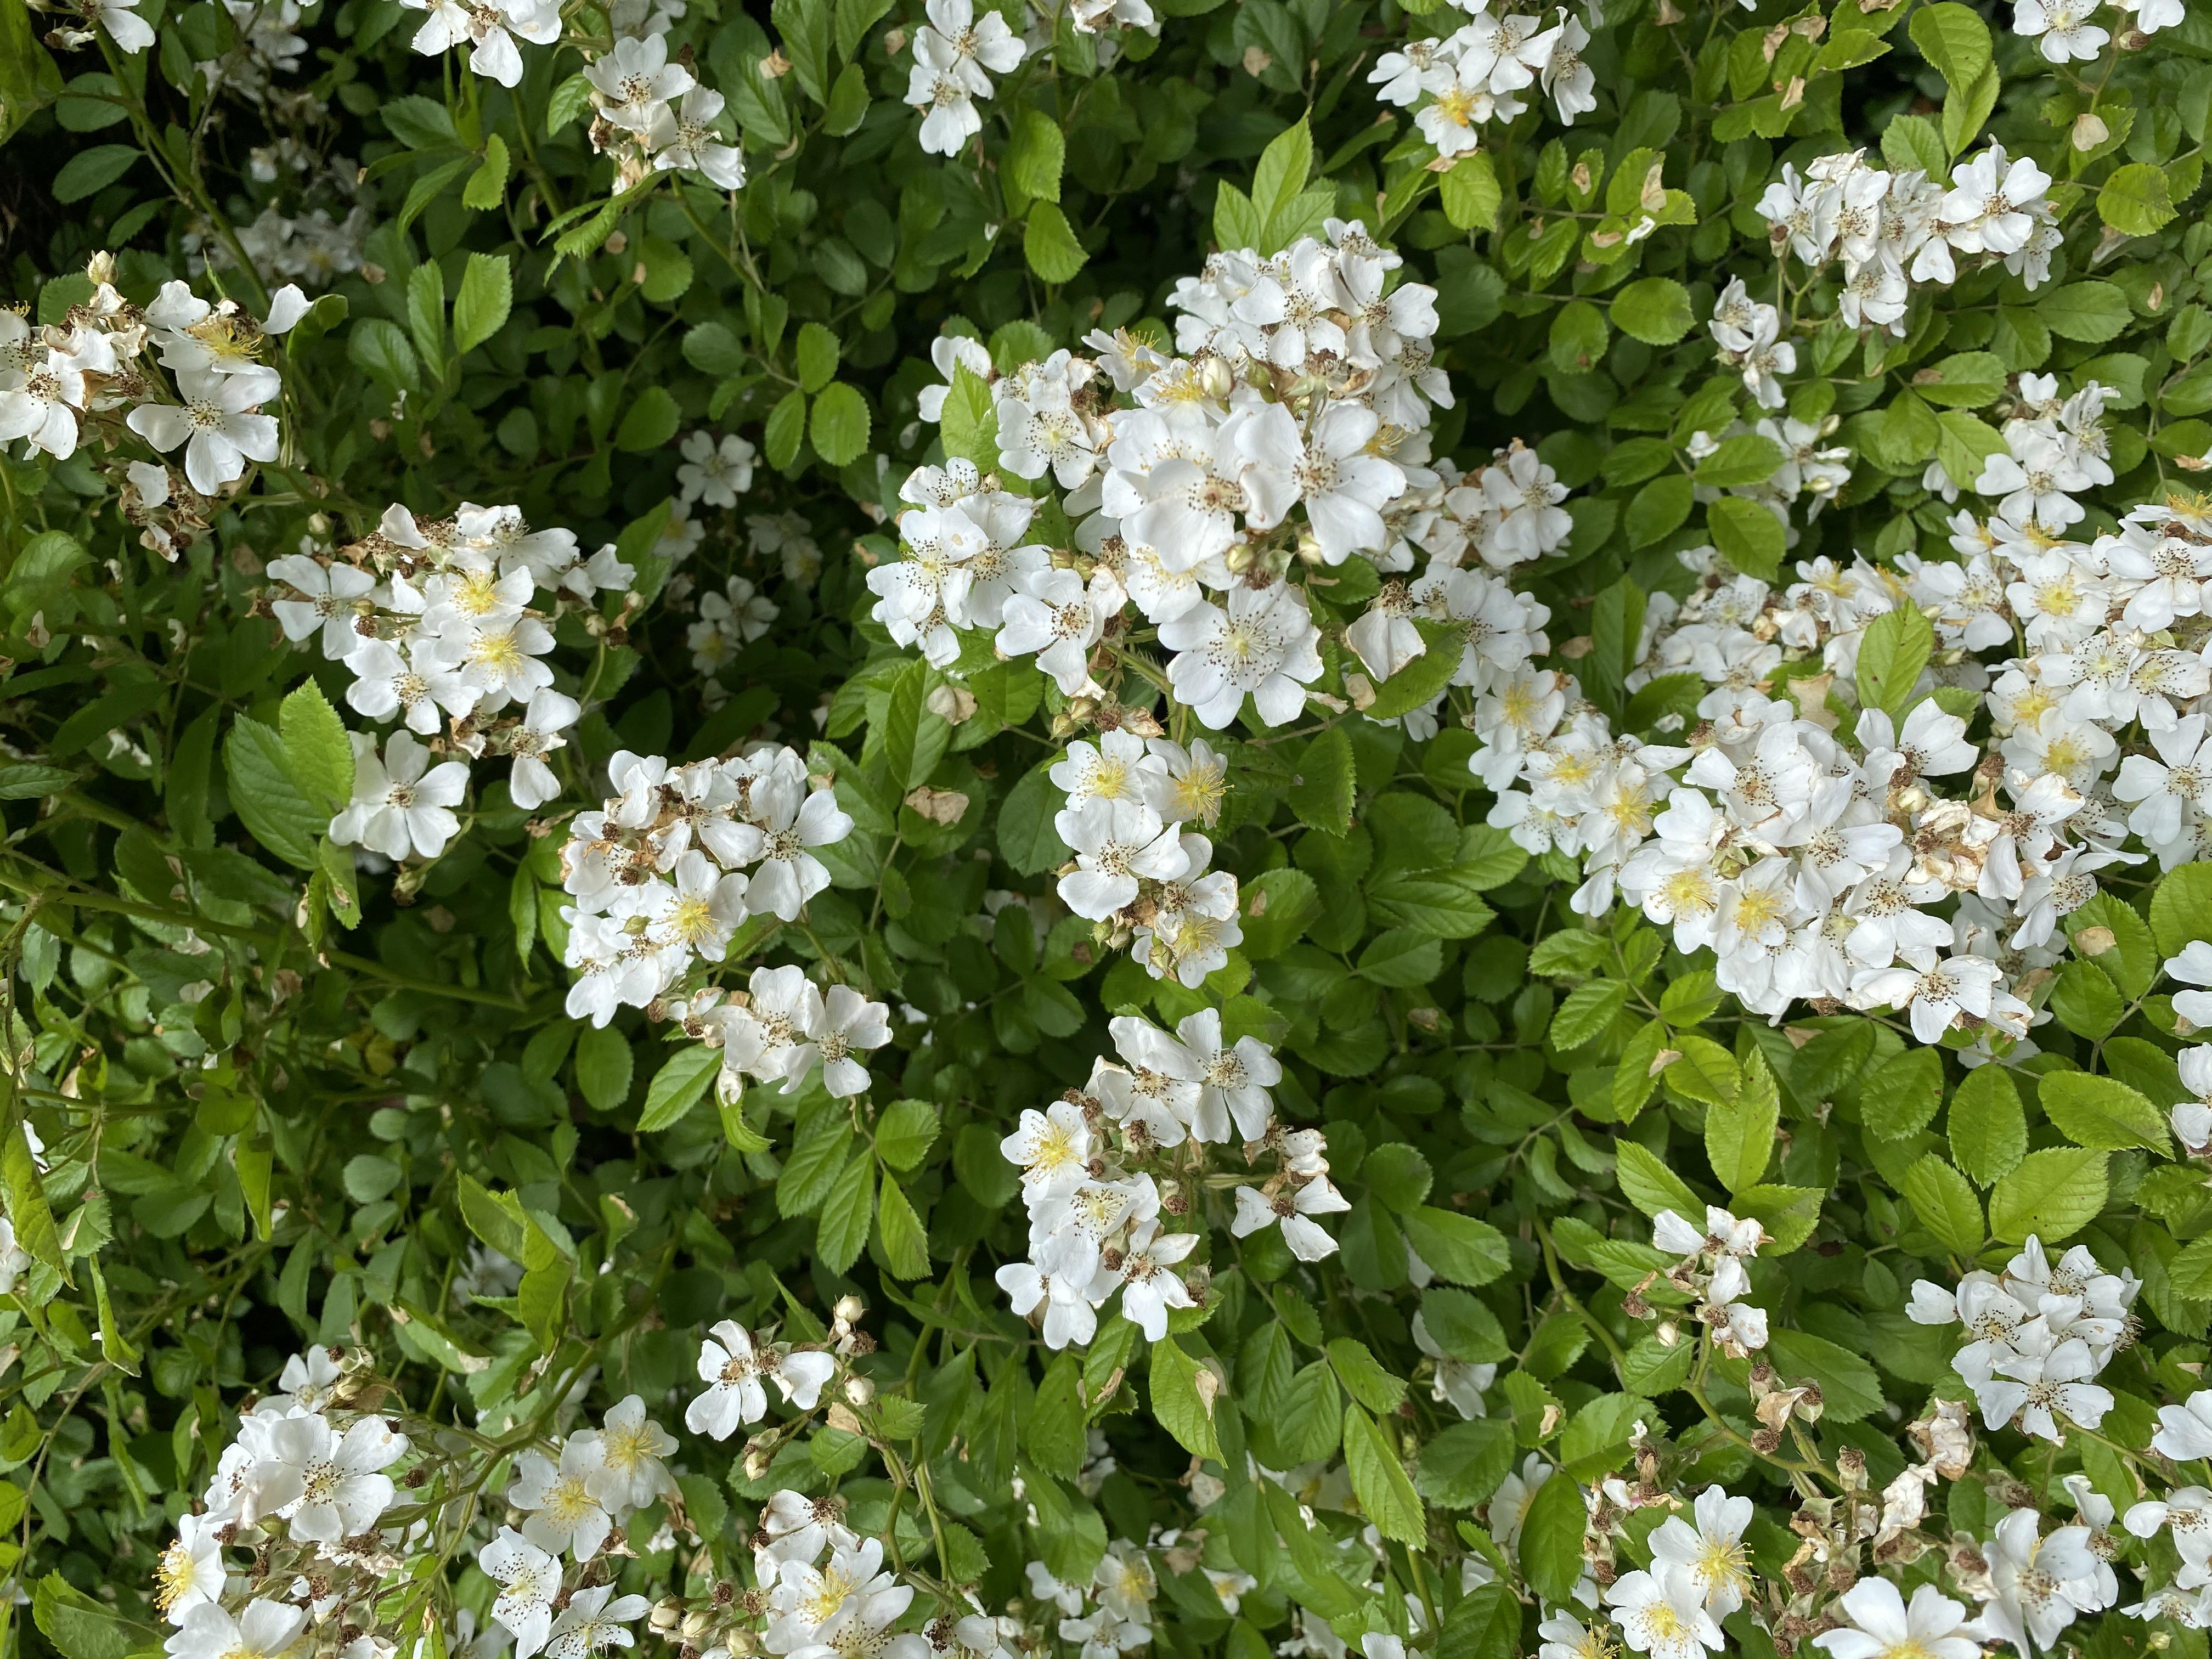 Giardini Visconte Rosa Canina